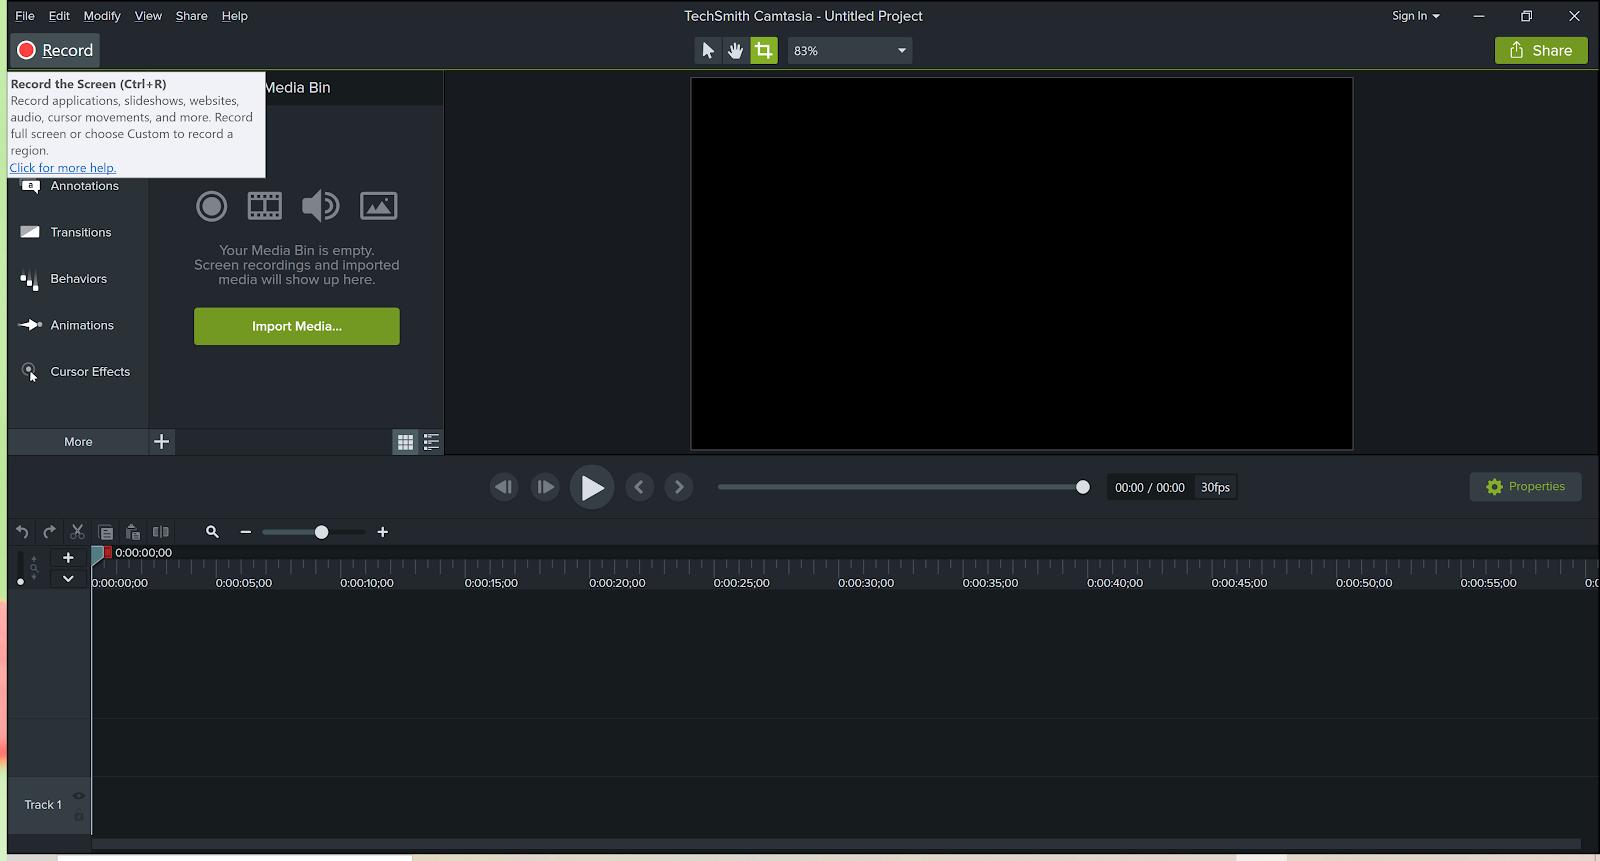 Screenshot of Camtasia screen capture software